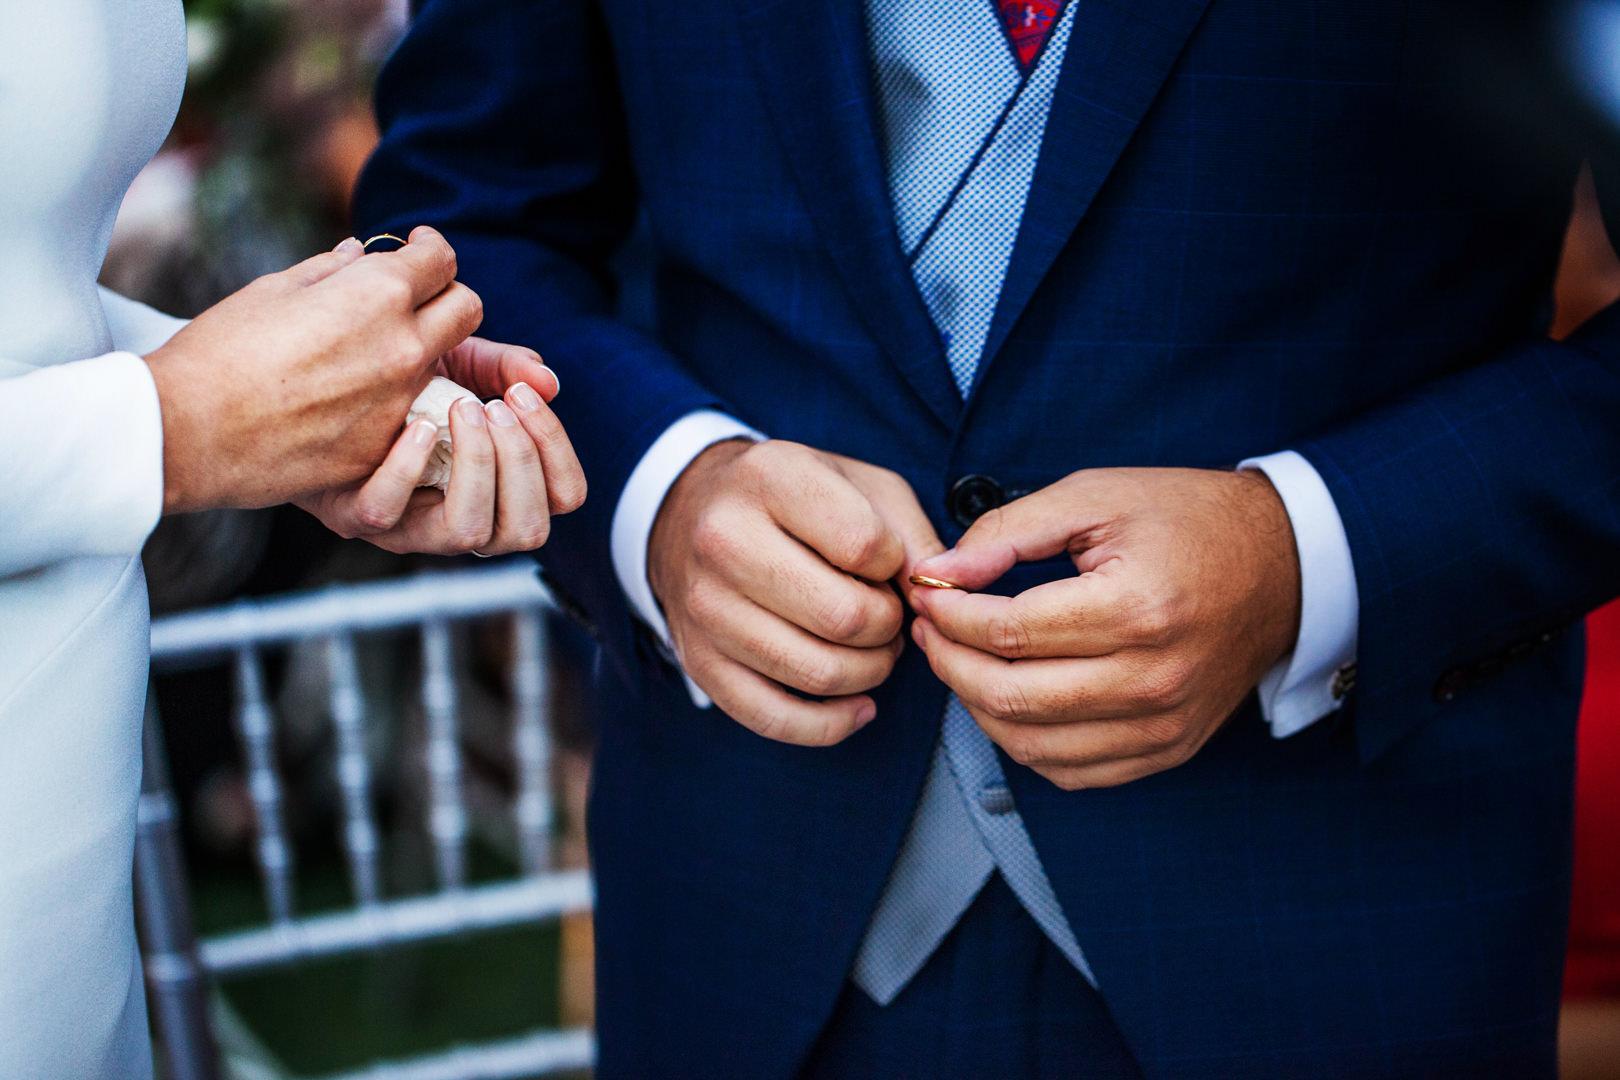 Boda-Irene-Marcos-Dos-Hermanas-Finca-Clotidle-engagement-Rafael-Torres-fotografo-bodas-sevilla-madrid-barcelona-wedding-photographer--26.jpg